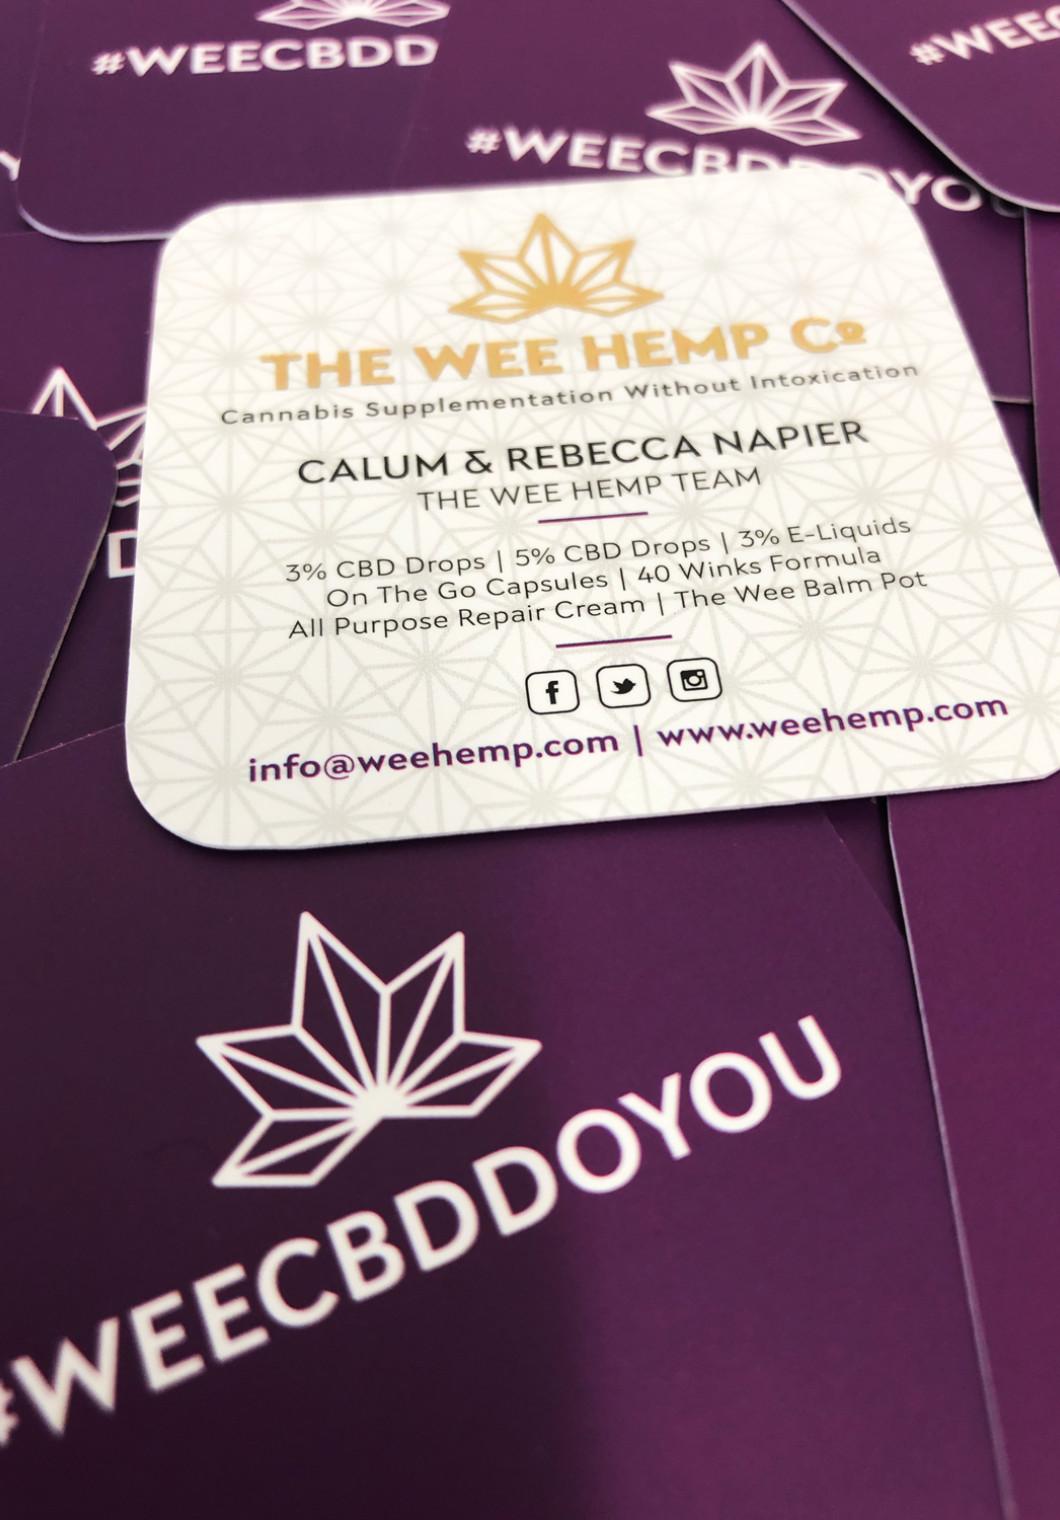 The Wee Hemp Co.